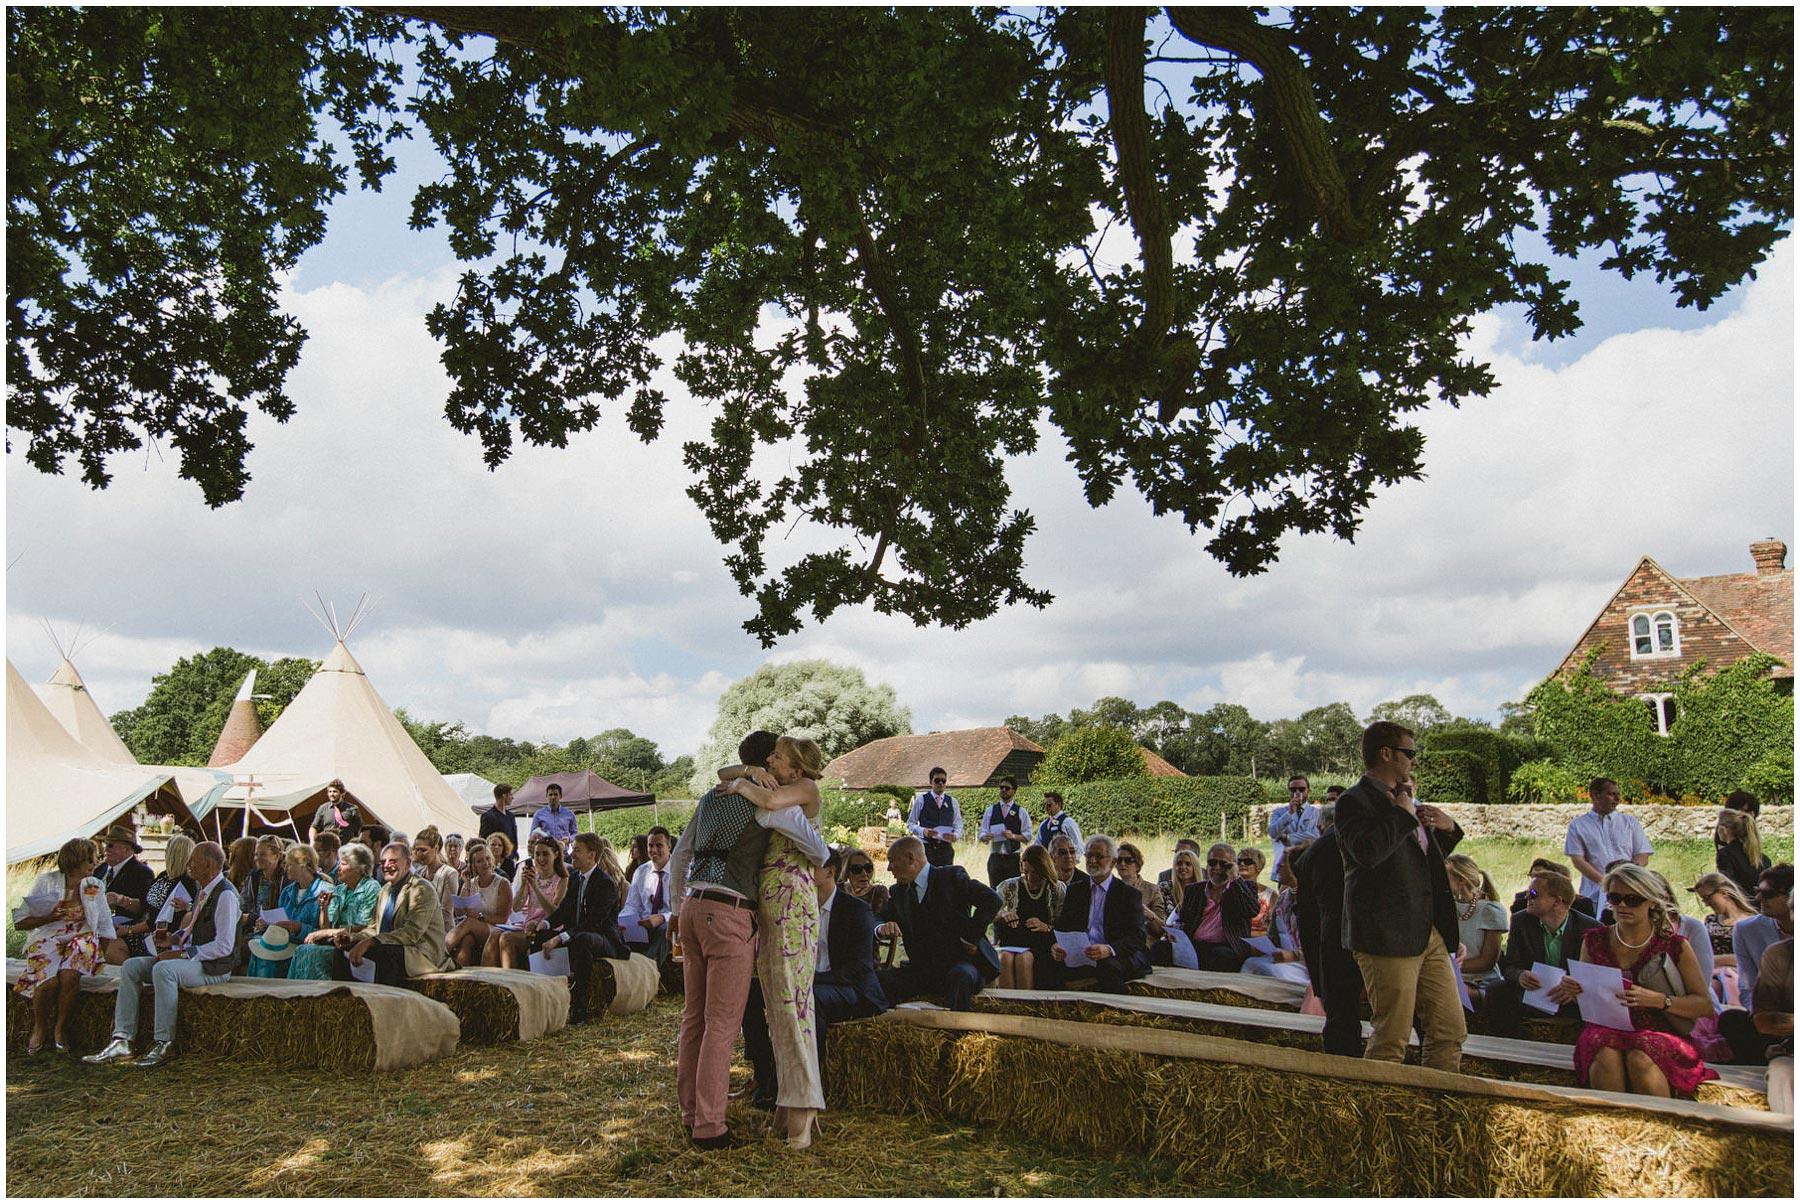 Kent-Festival-Tipi-wedding-photography_0054